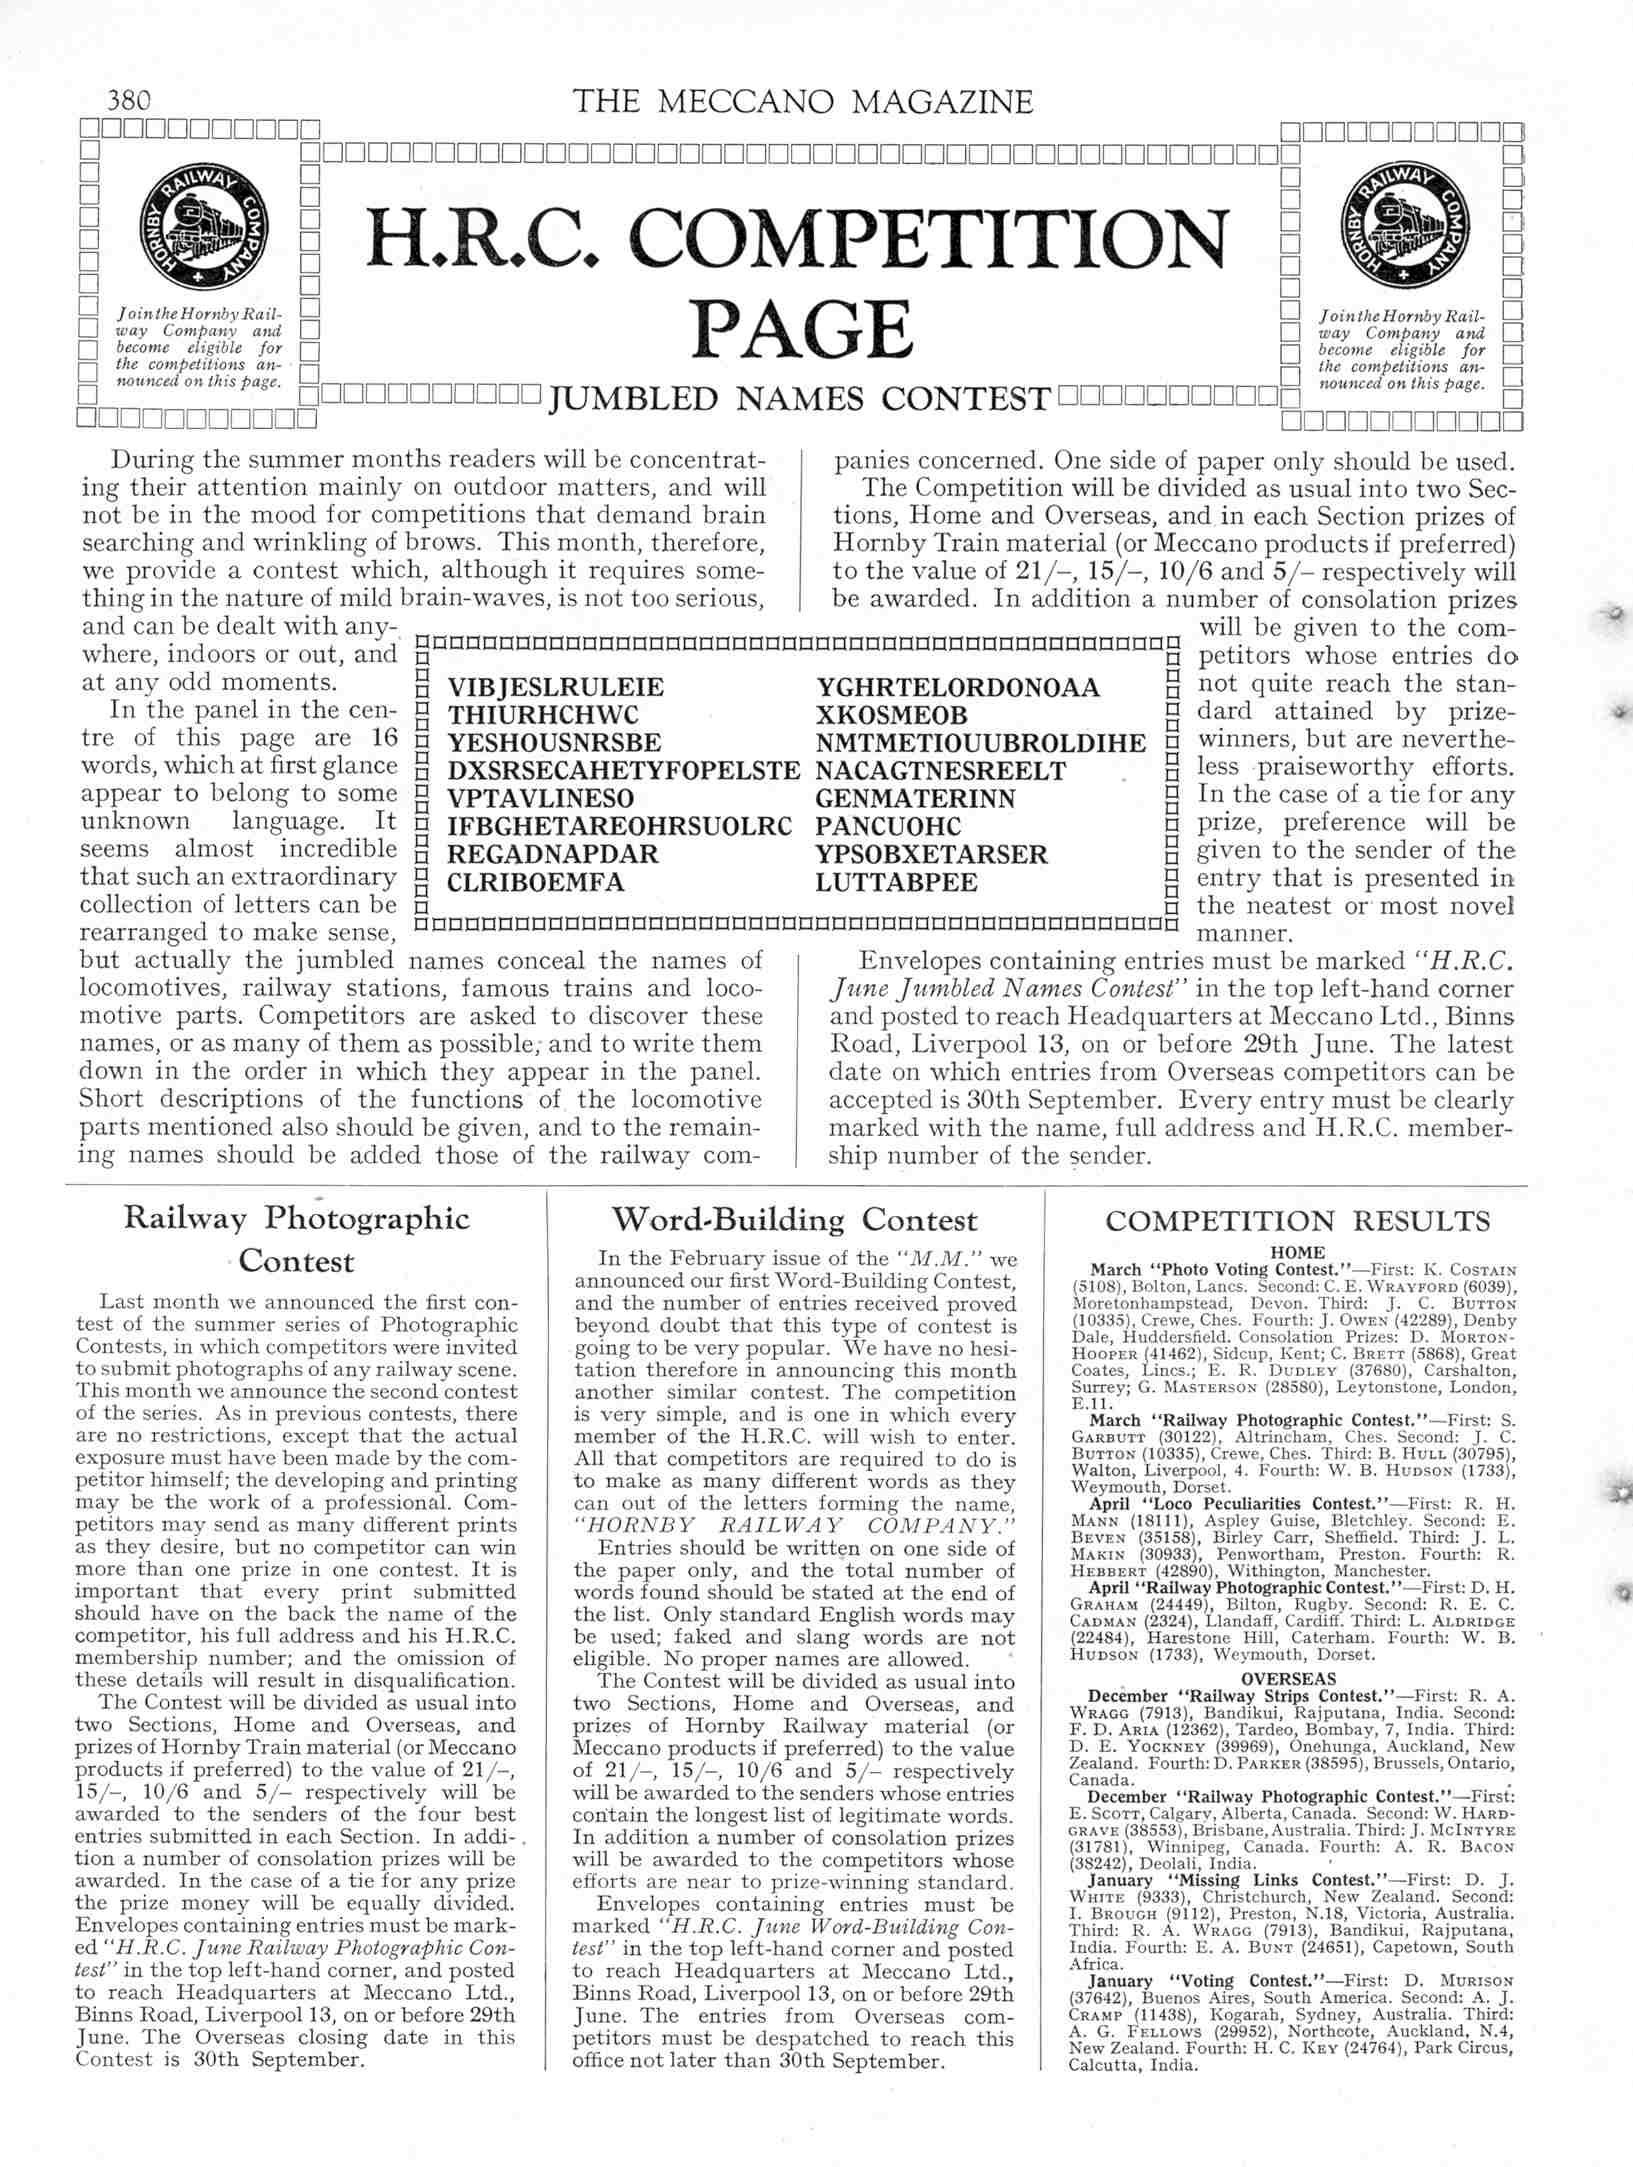 UK Meccano Magazine June 1935 Page 380